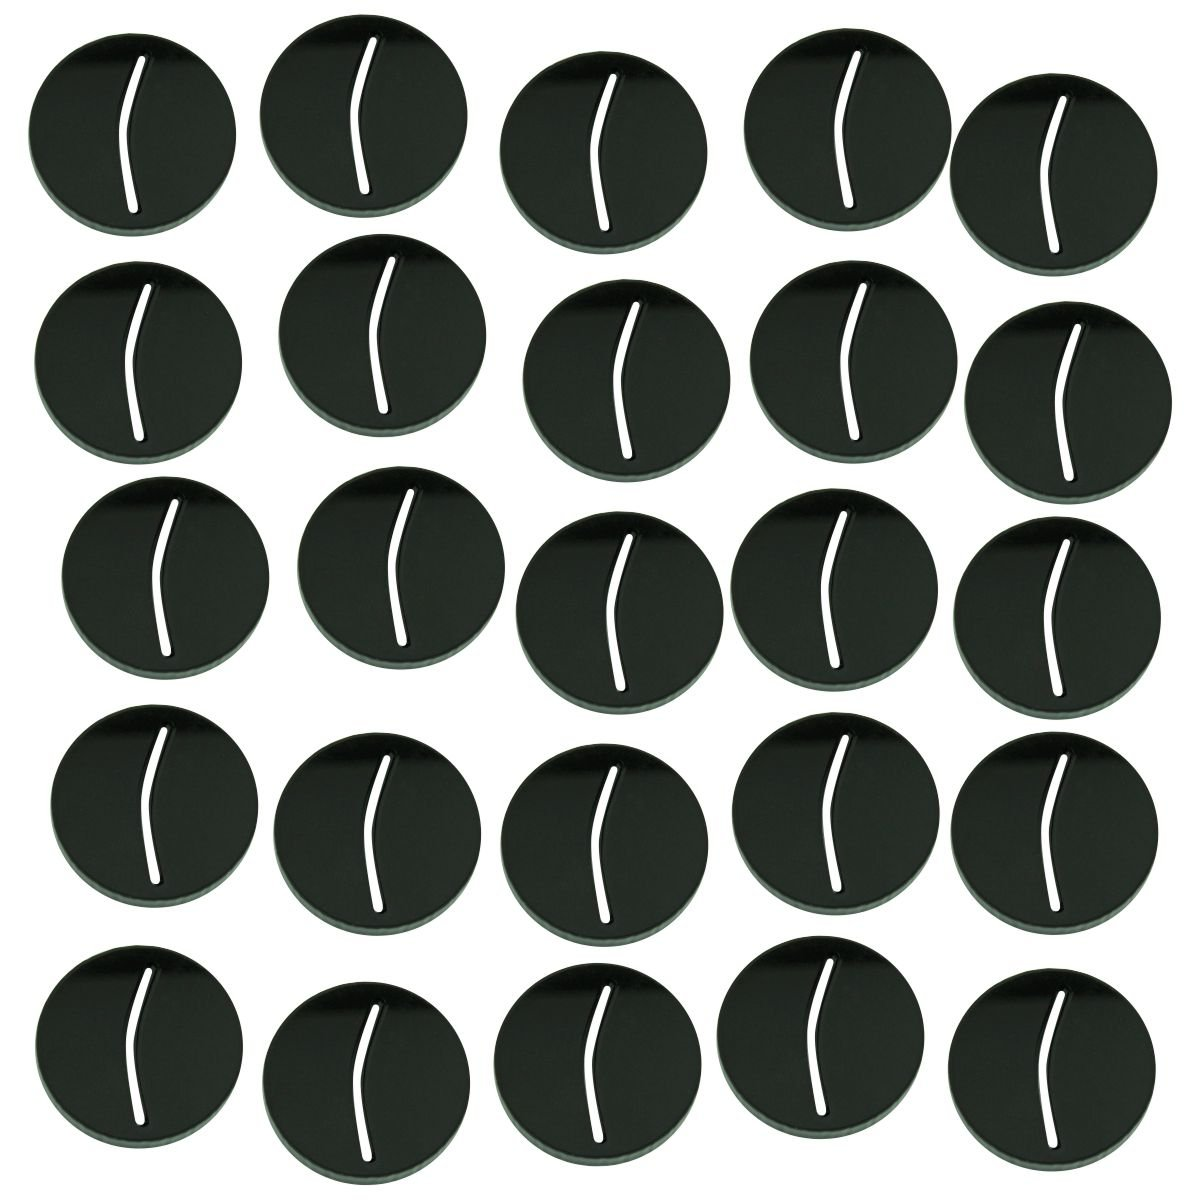 LITKO Paper Miniature Bases, 25mm Circle, 3mm Black (25) by LITKO